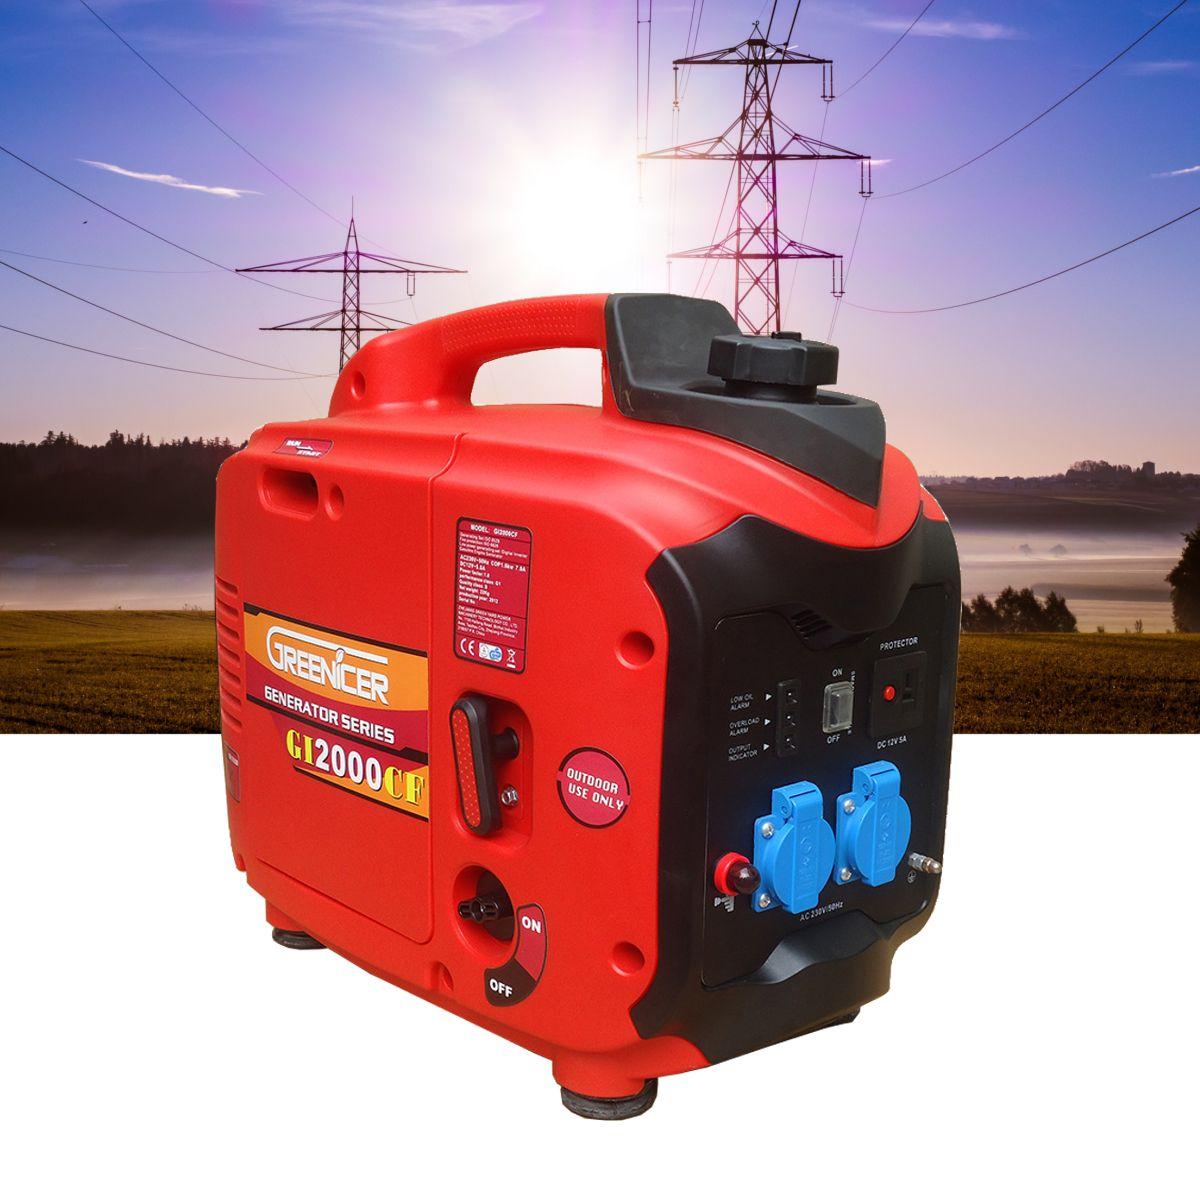 1/2/3KW 220 v Tragbare Elektrische DC/AC Inverter Generator Digital Benzin Angetrieben Motor Generator Set ture Power Niedrigen kraftstoff